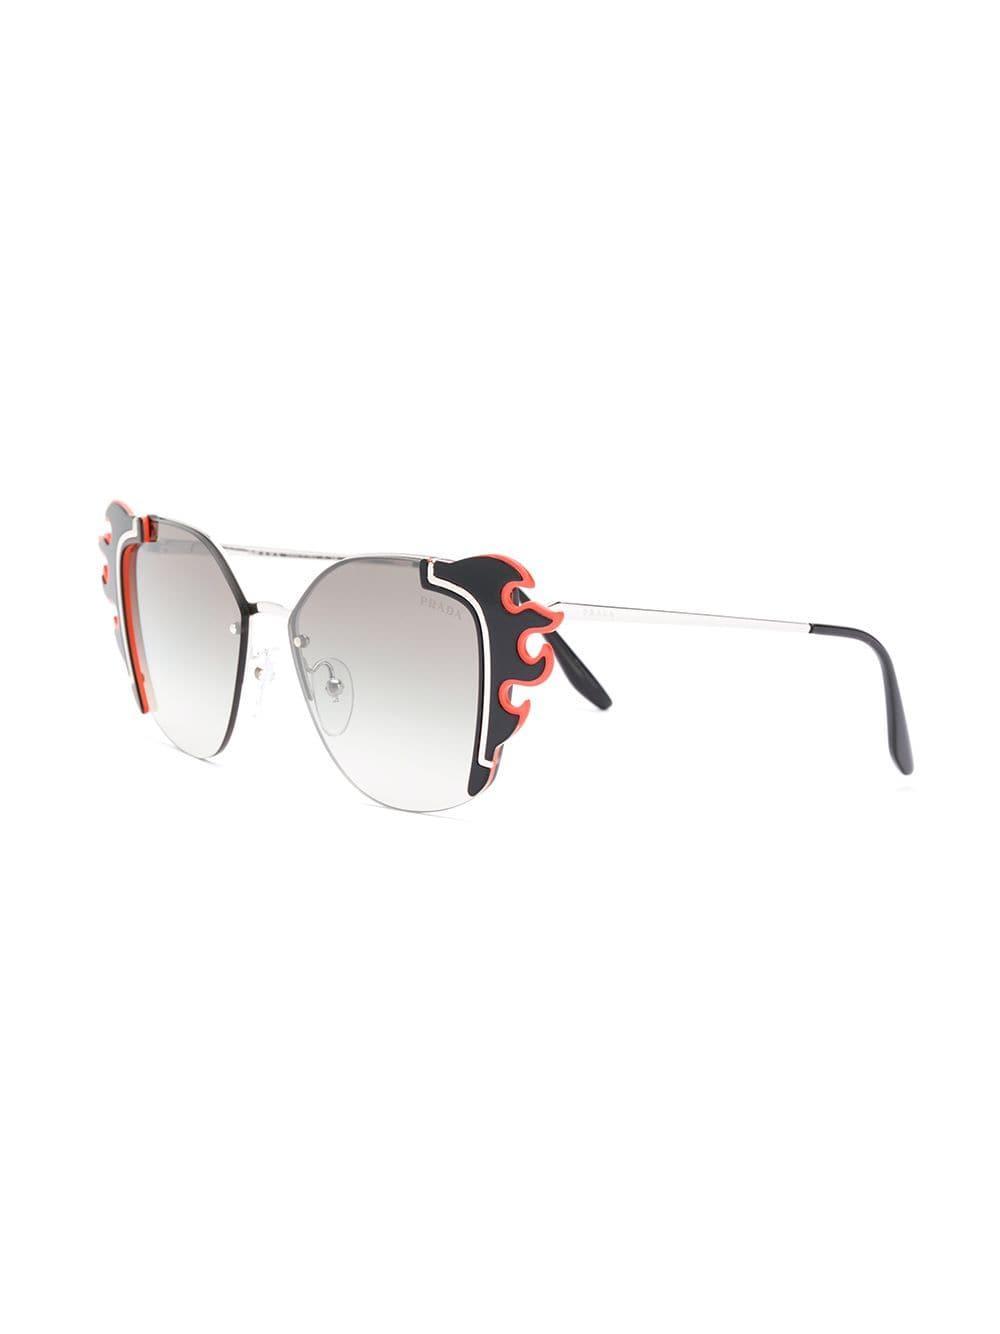 a7f798869eb Prada - Black Flame Shaped Sunglasses - Lyst. View fullscreen